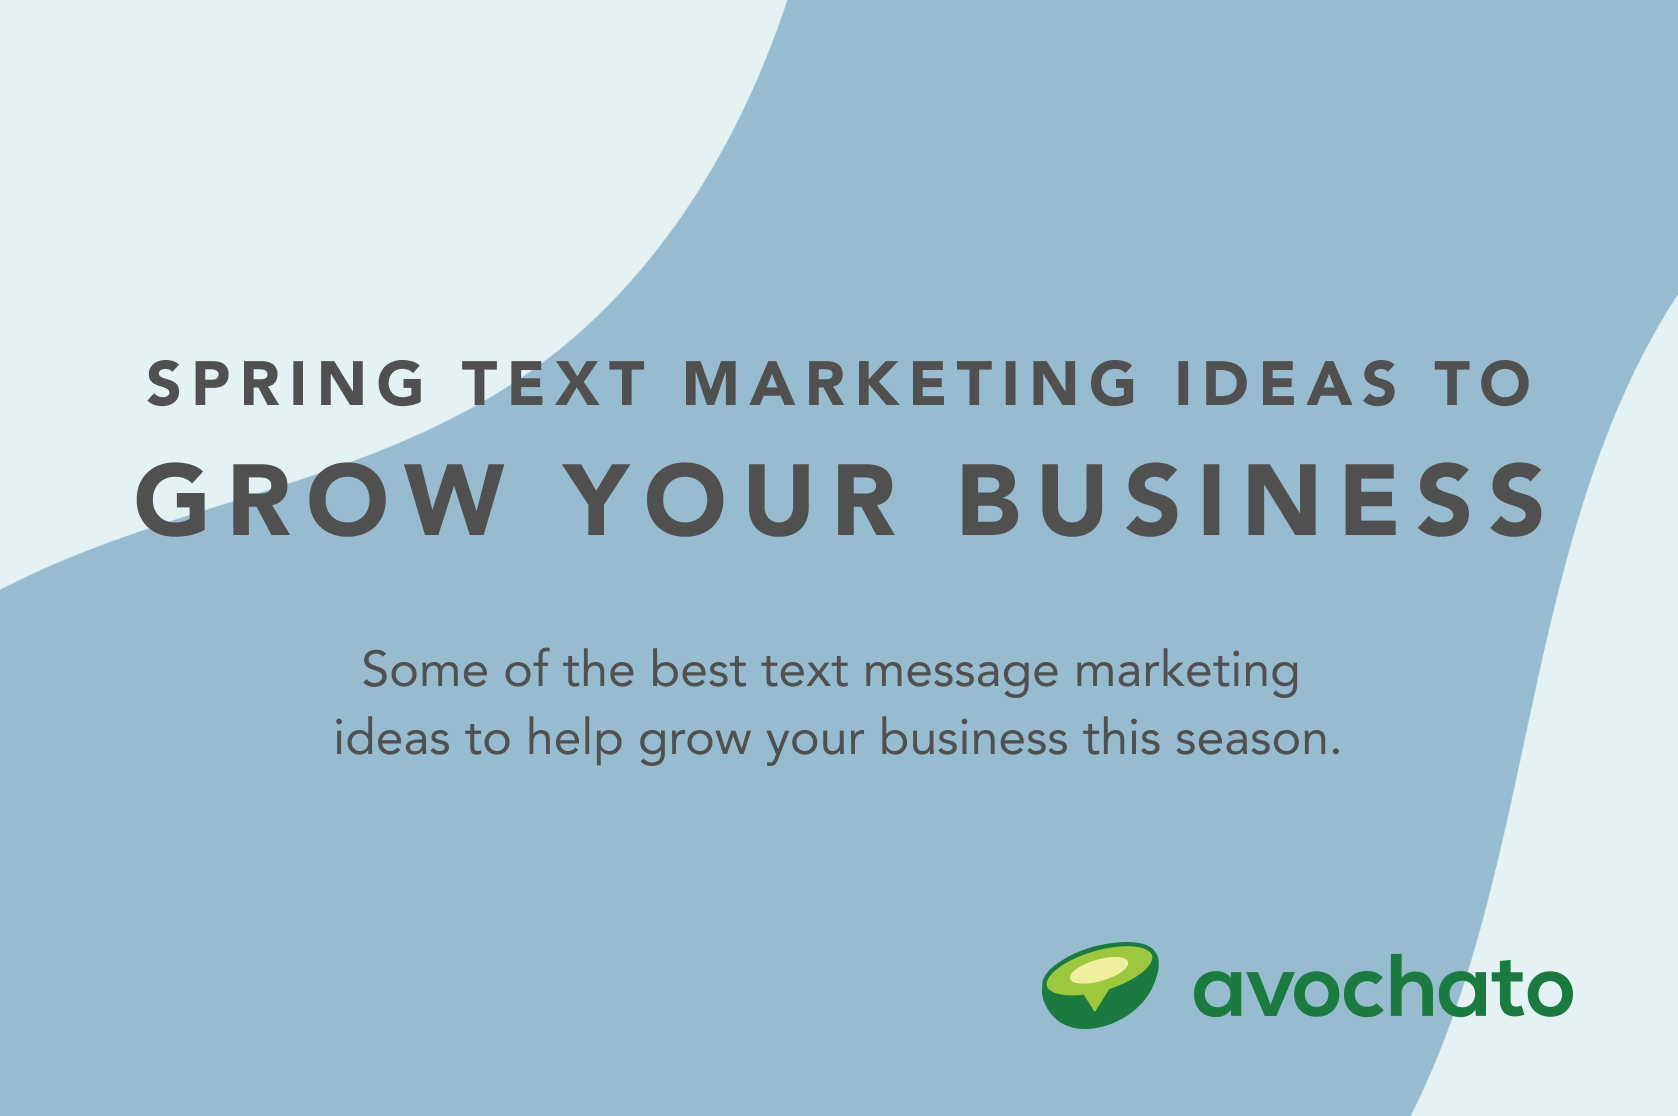 spring text marketing